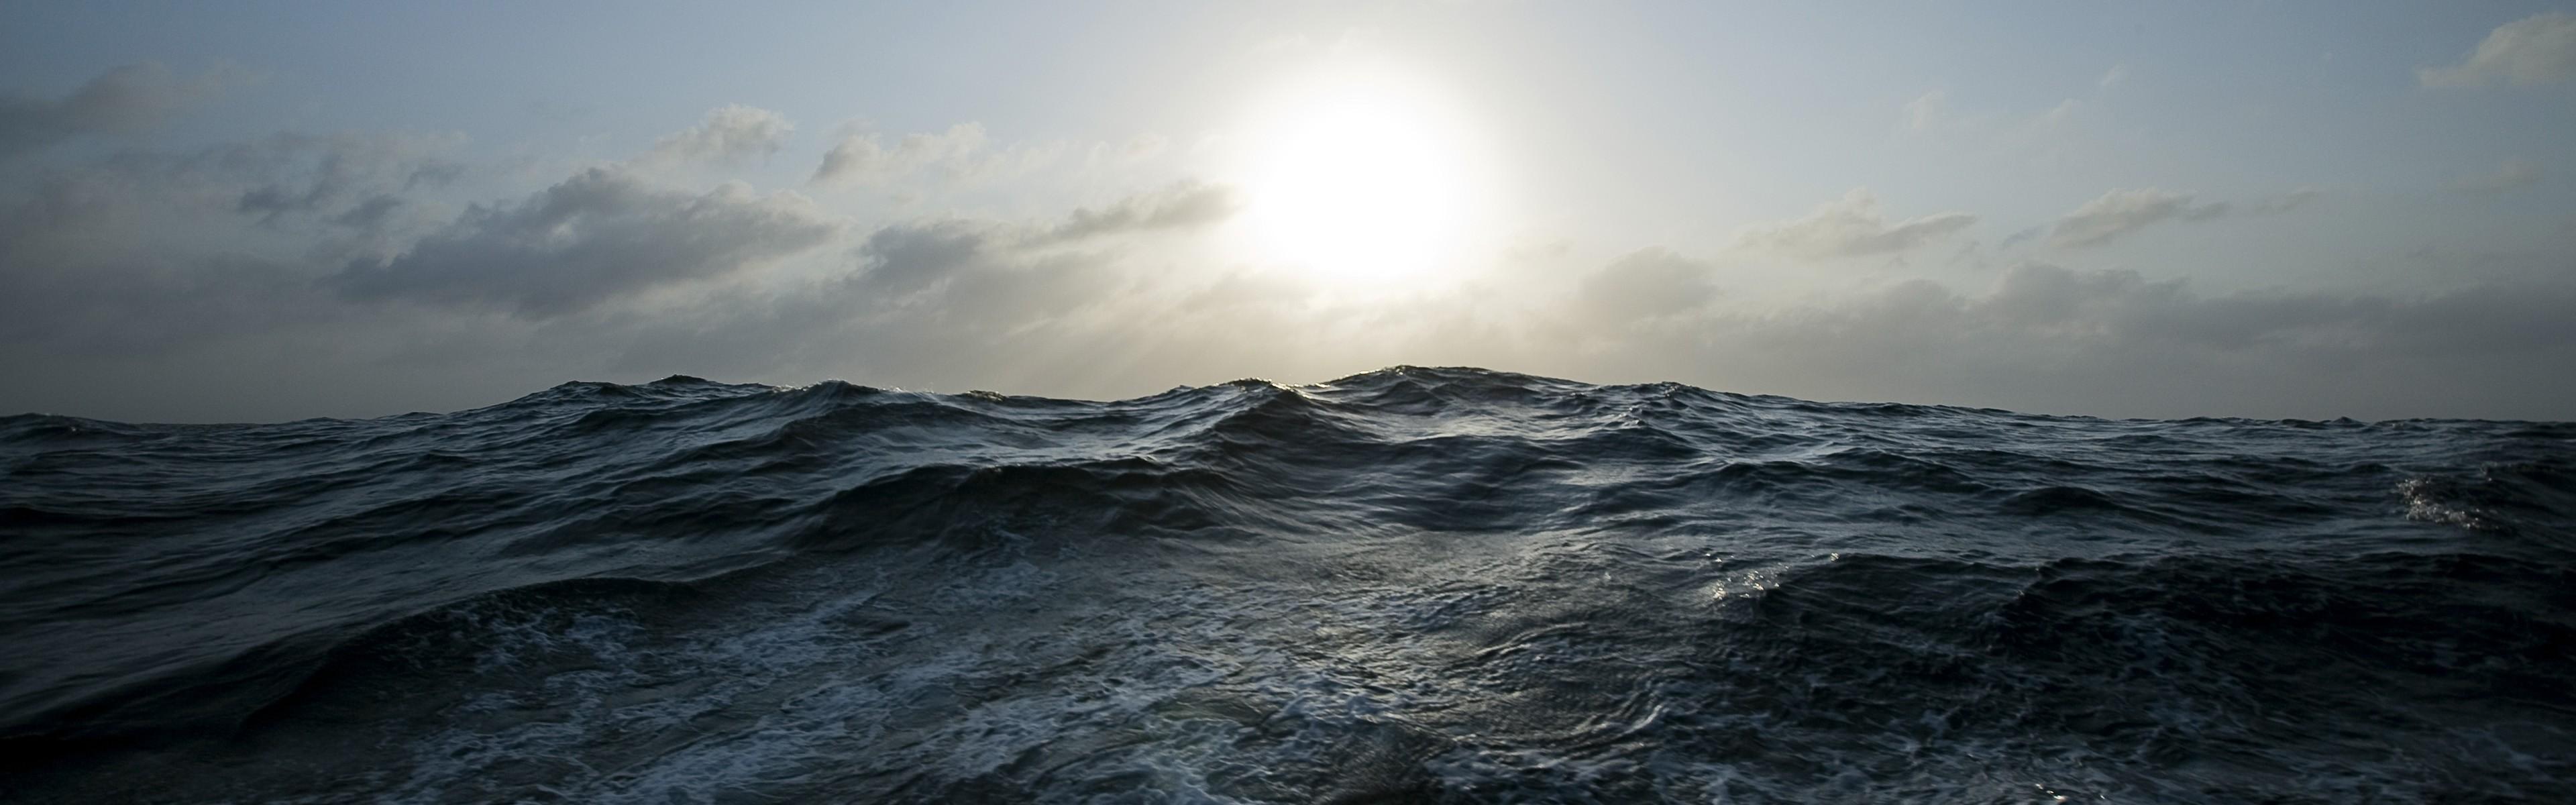 Water Sun Panorama Seascapes Wallpaper 3840x1200 56576